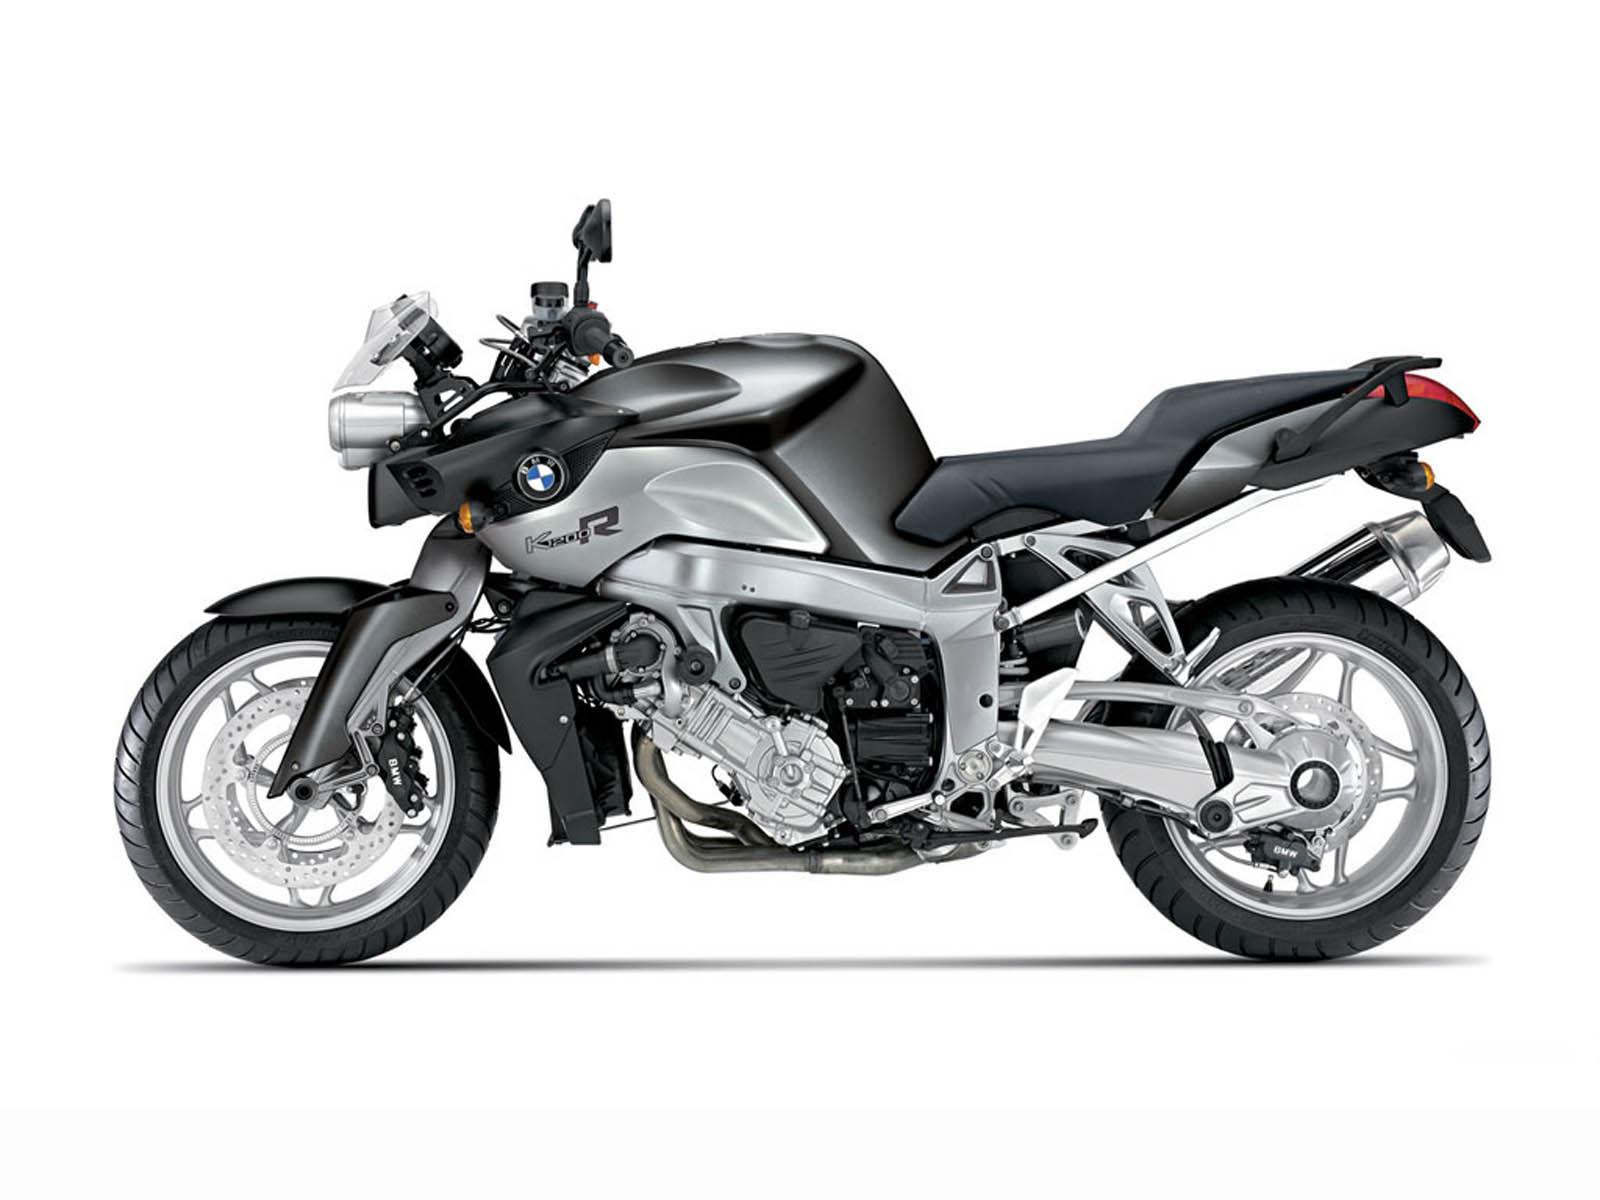 Wallpapers: BMW K 1200 R Bike Wallpapers